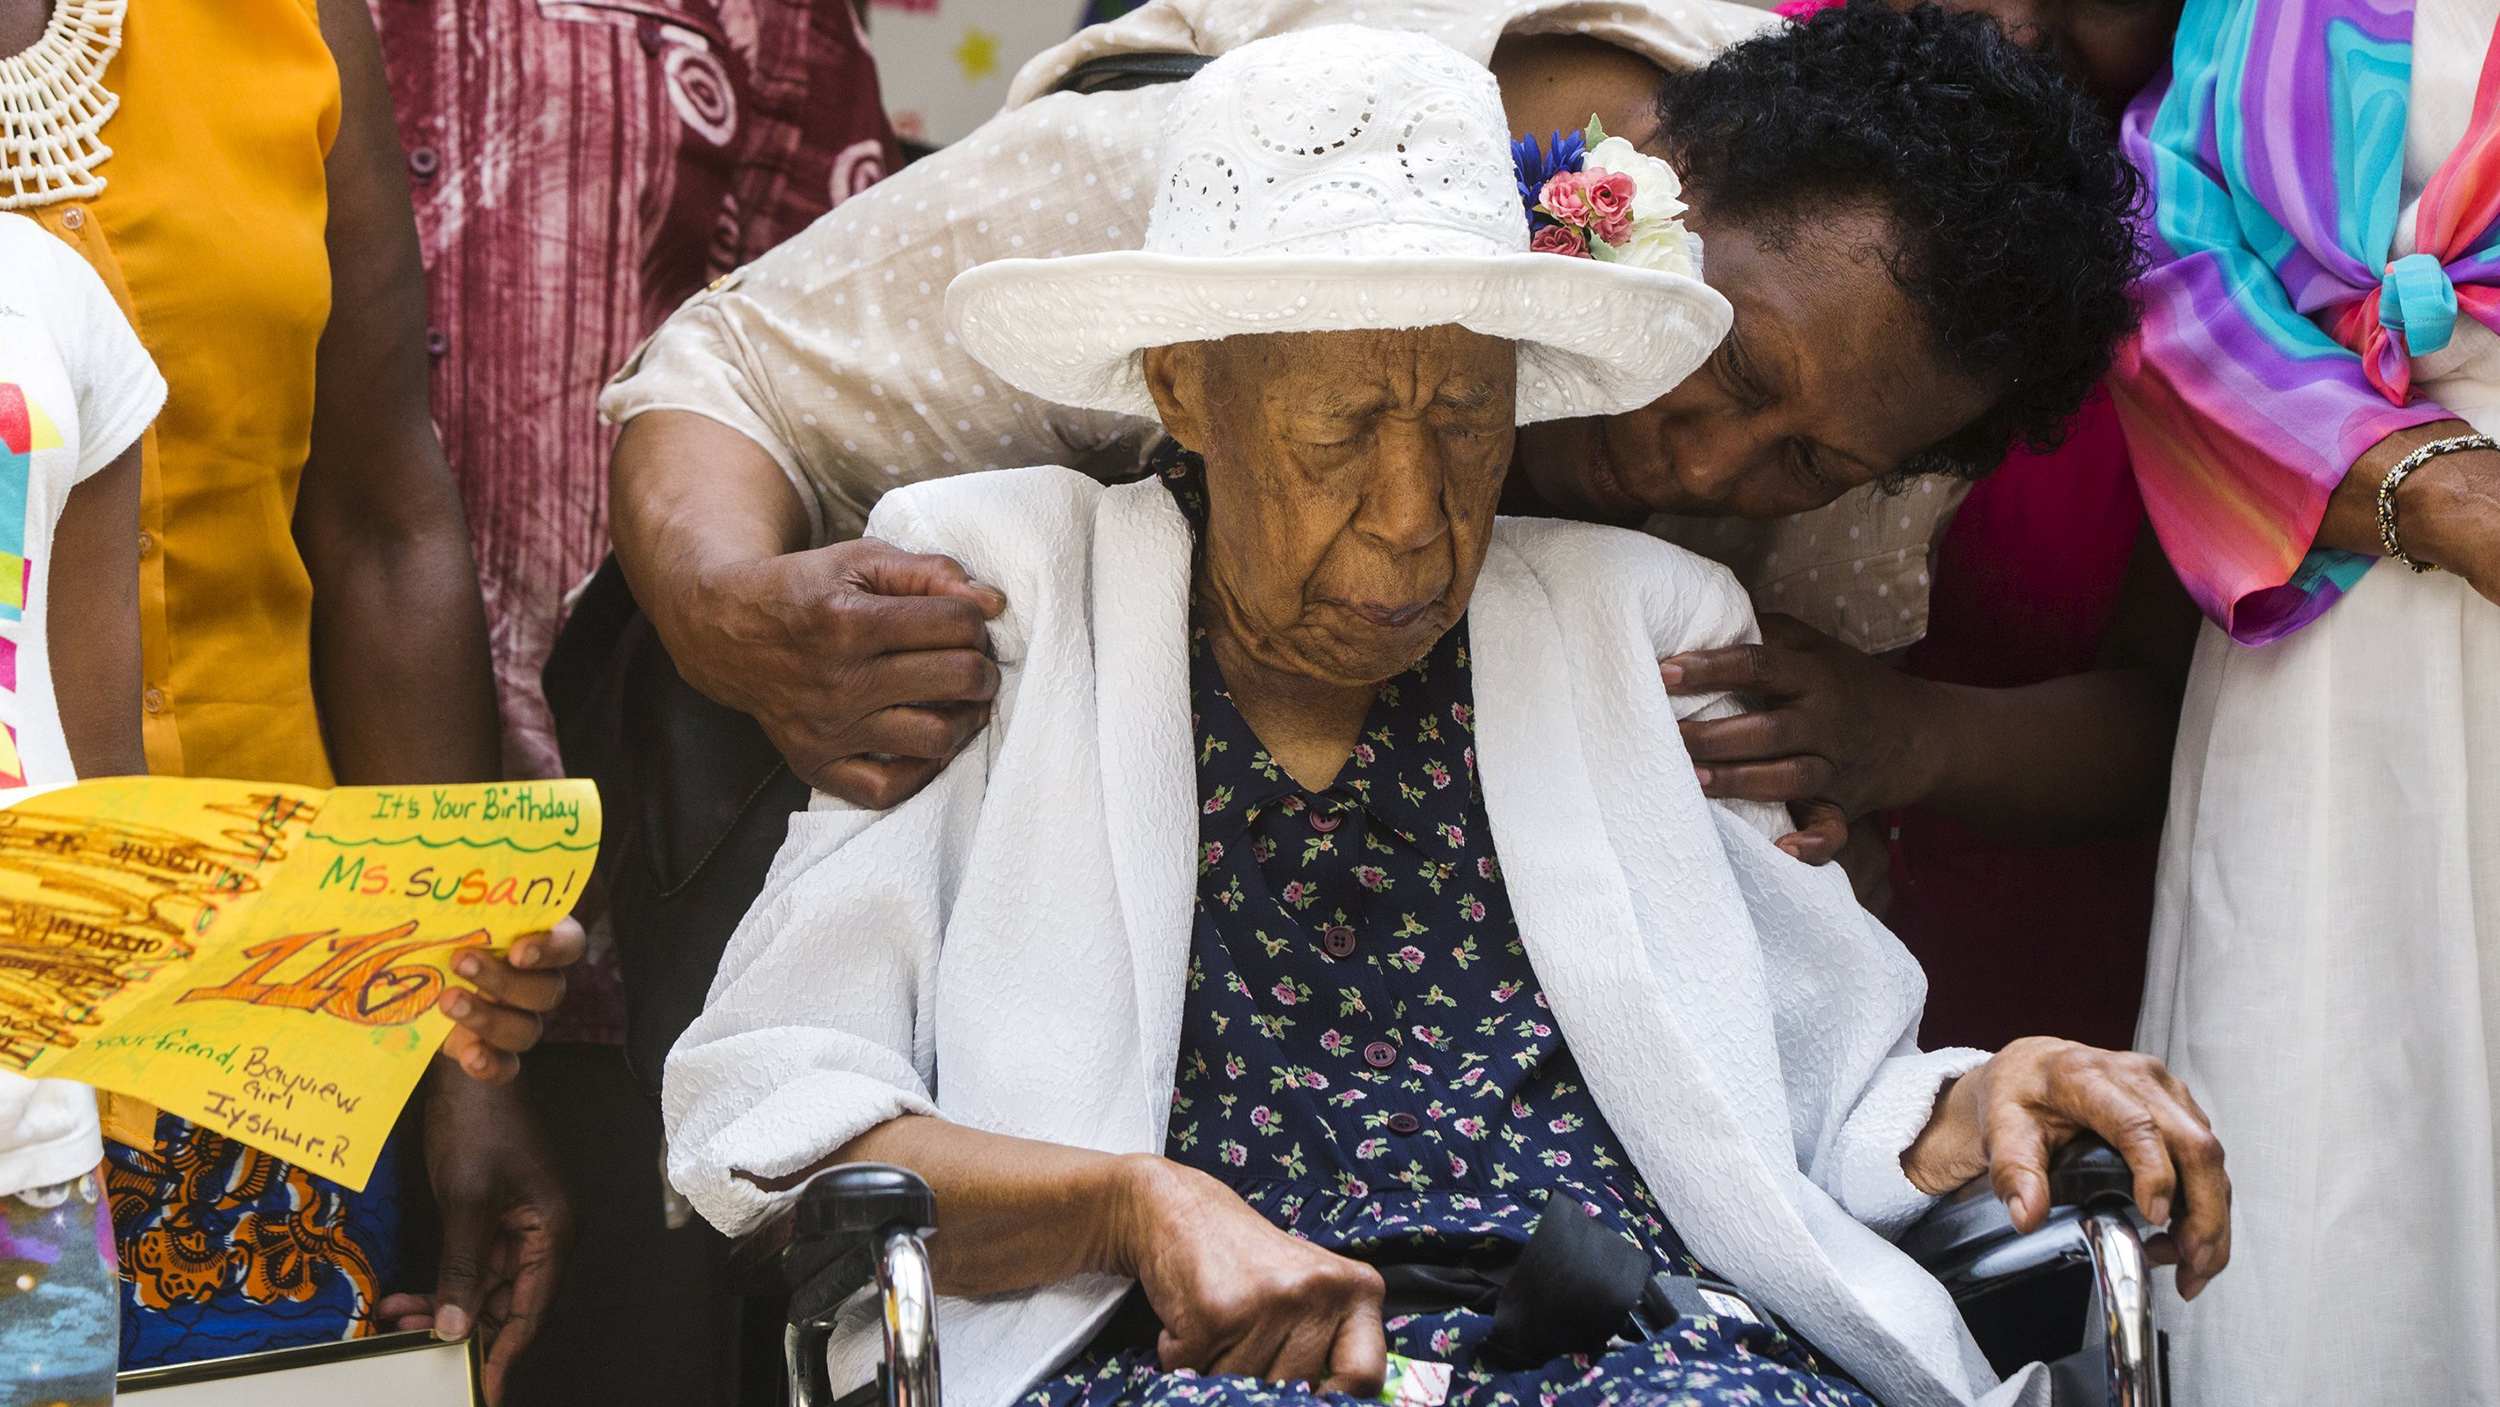 Oldest living woman bacon inline 3 151008 a3ed7c5ac7b19f929de43c203b30ca5b